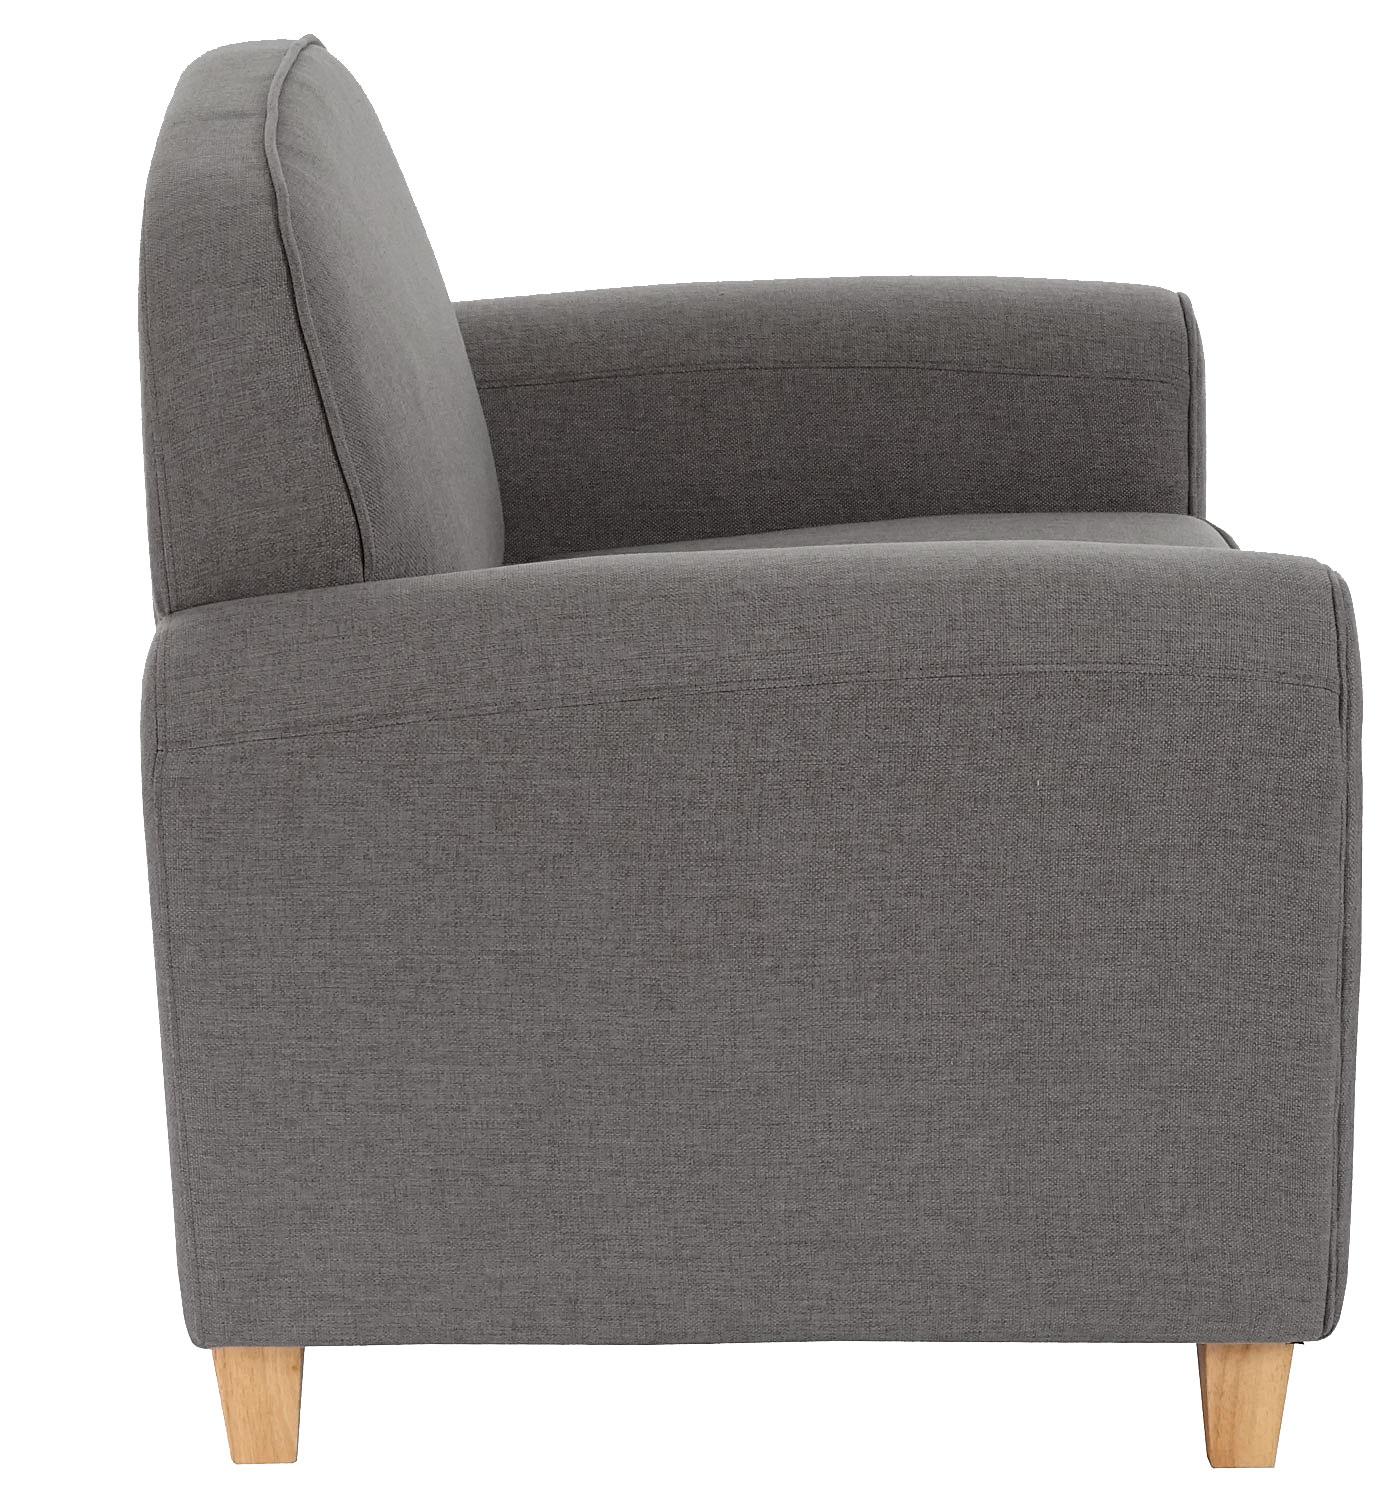 sessel malm t377 loungesessel polstersessel retro 50er jahre design dunkelgrau textil. Black Bedroom Furniture Sets. Home Design Ideas